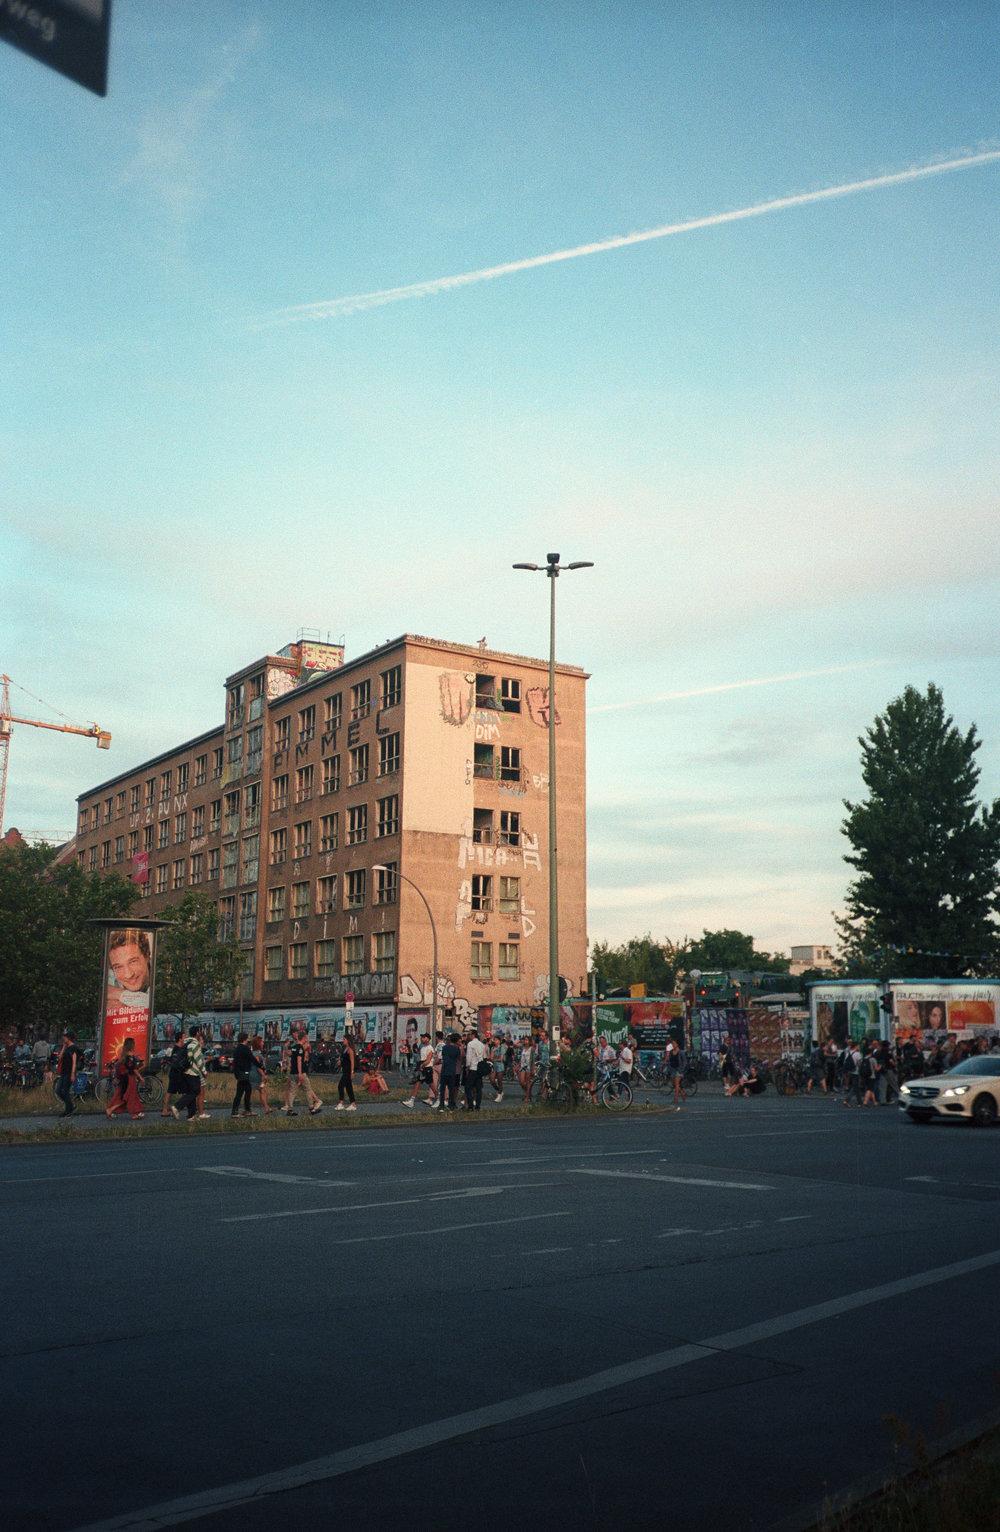 Berlin_72dpi-62.jpg